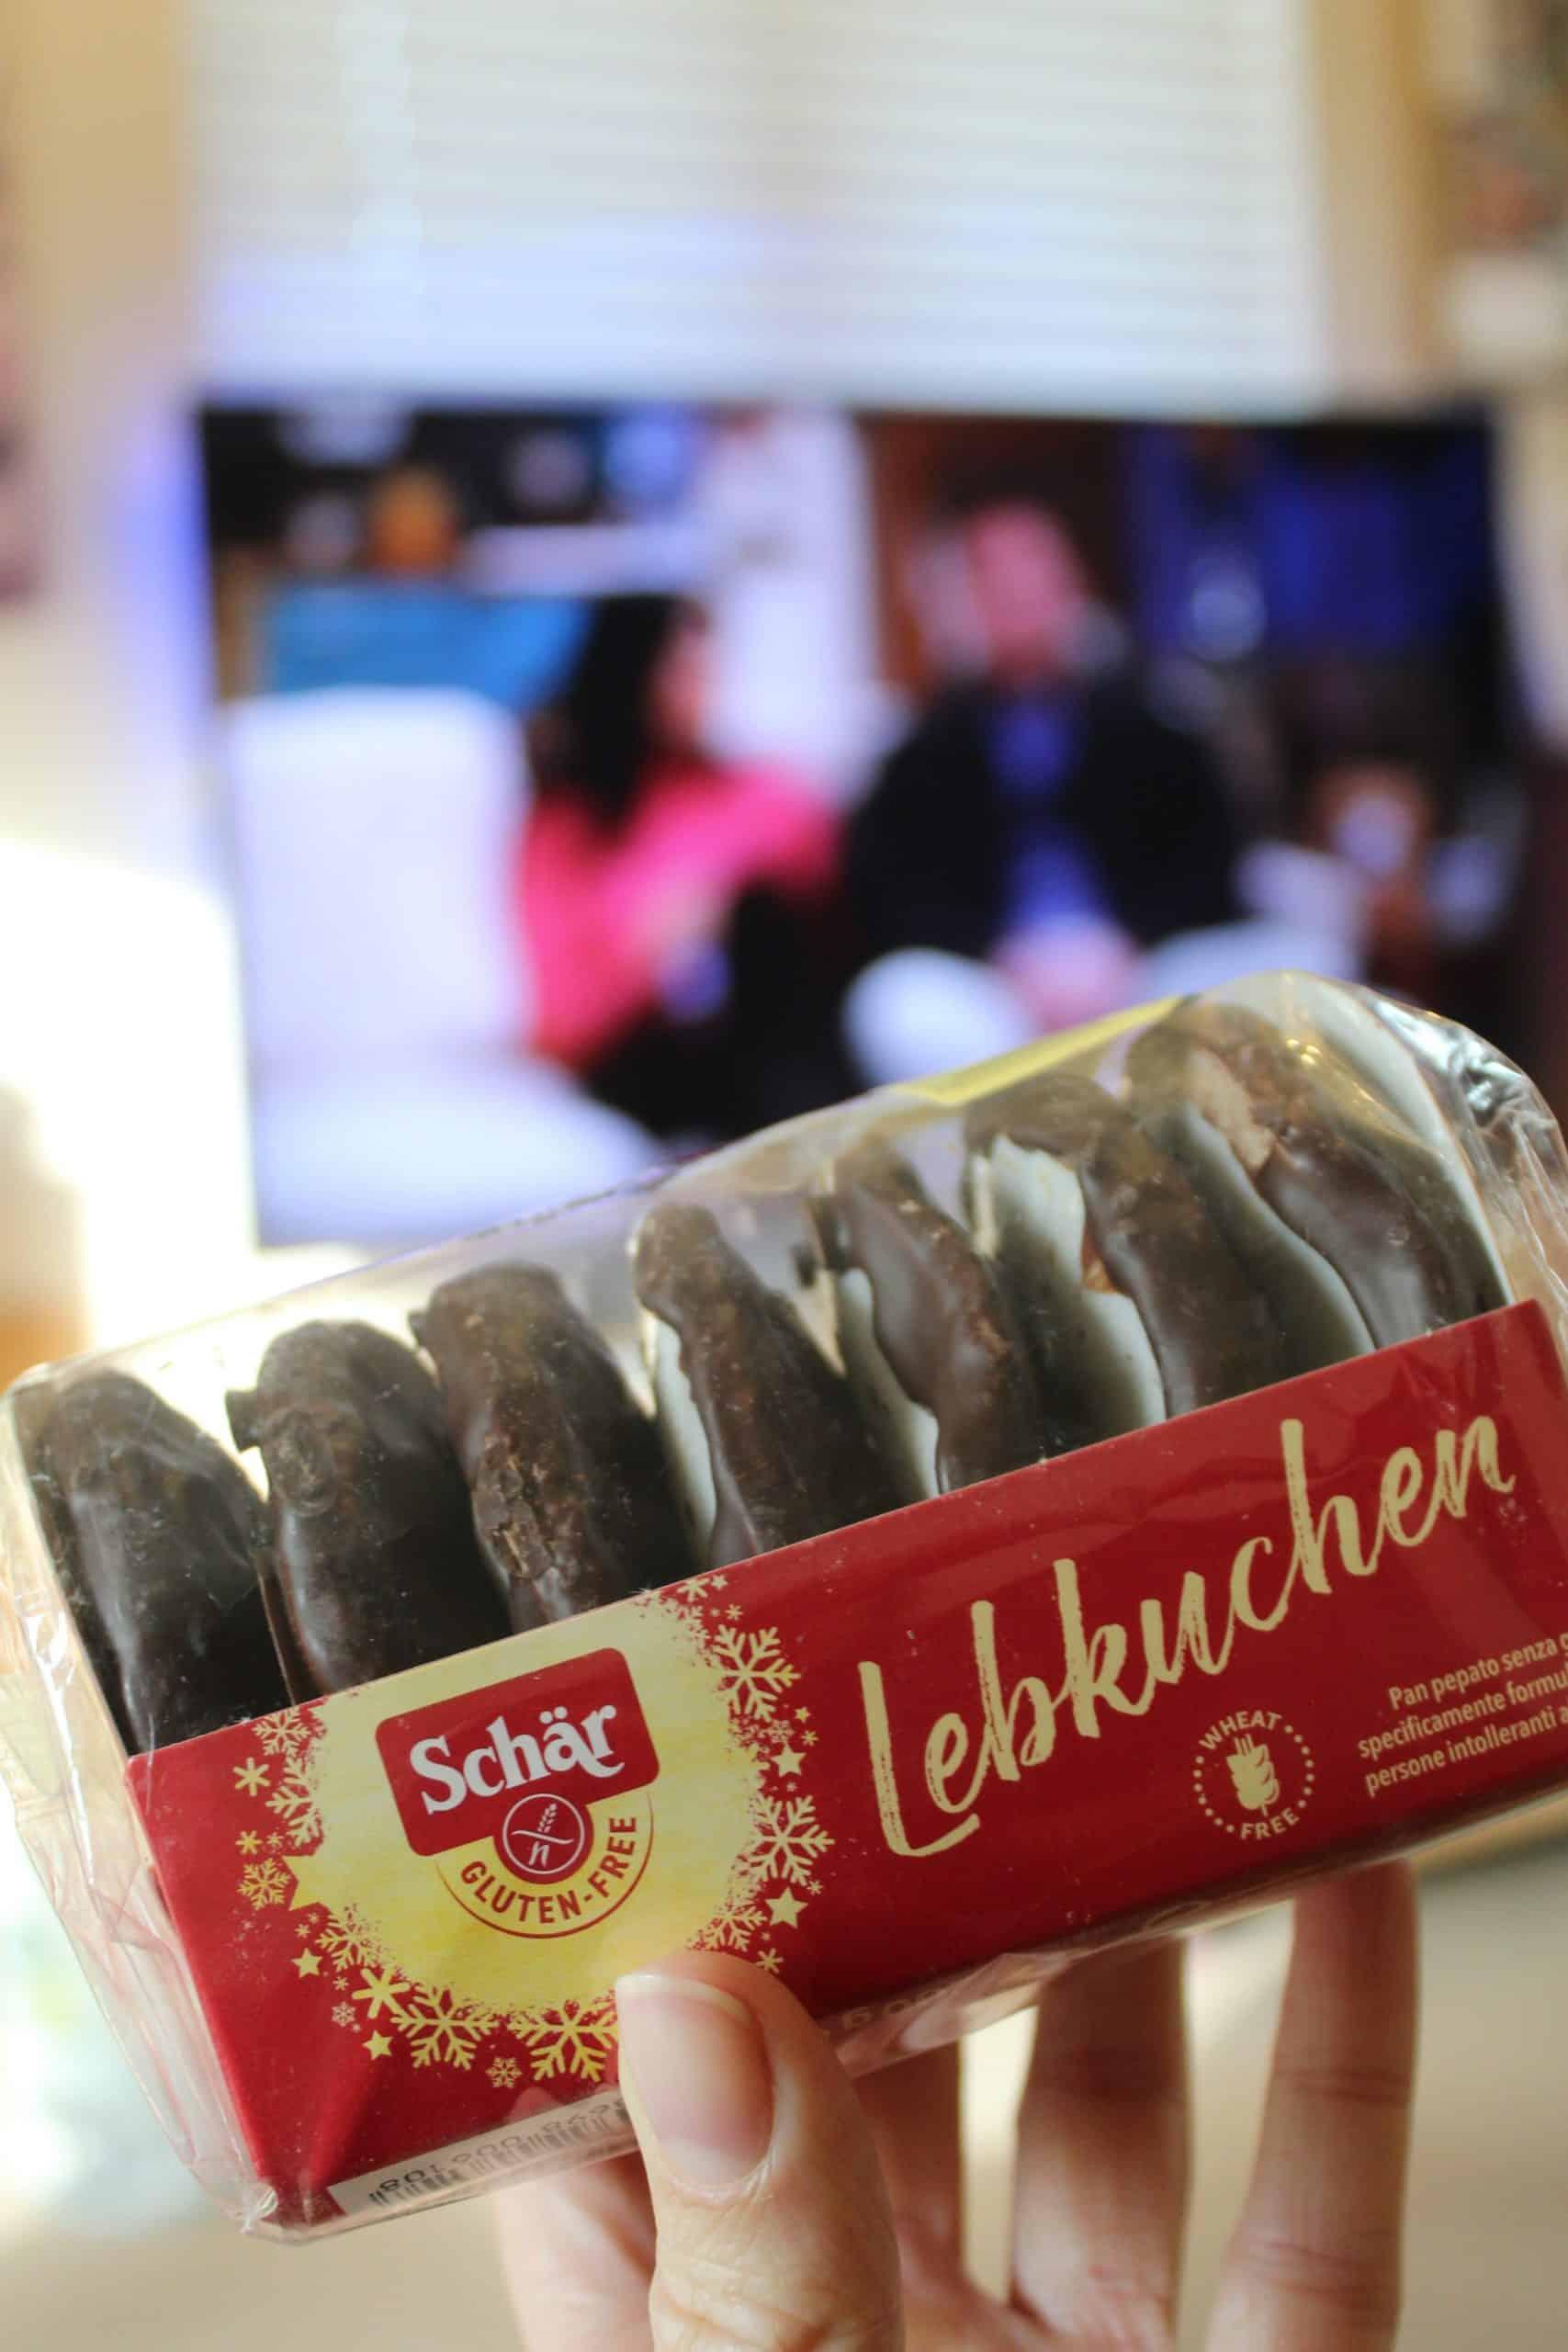 Gluten free Christmas products Schar UK 35